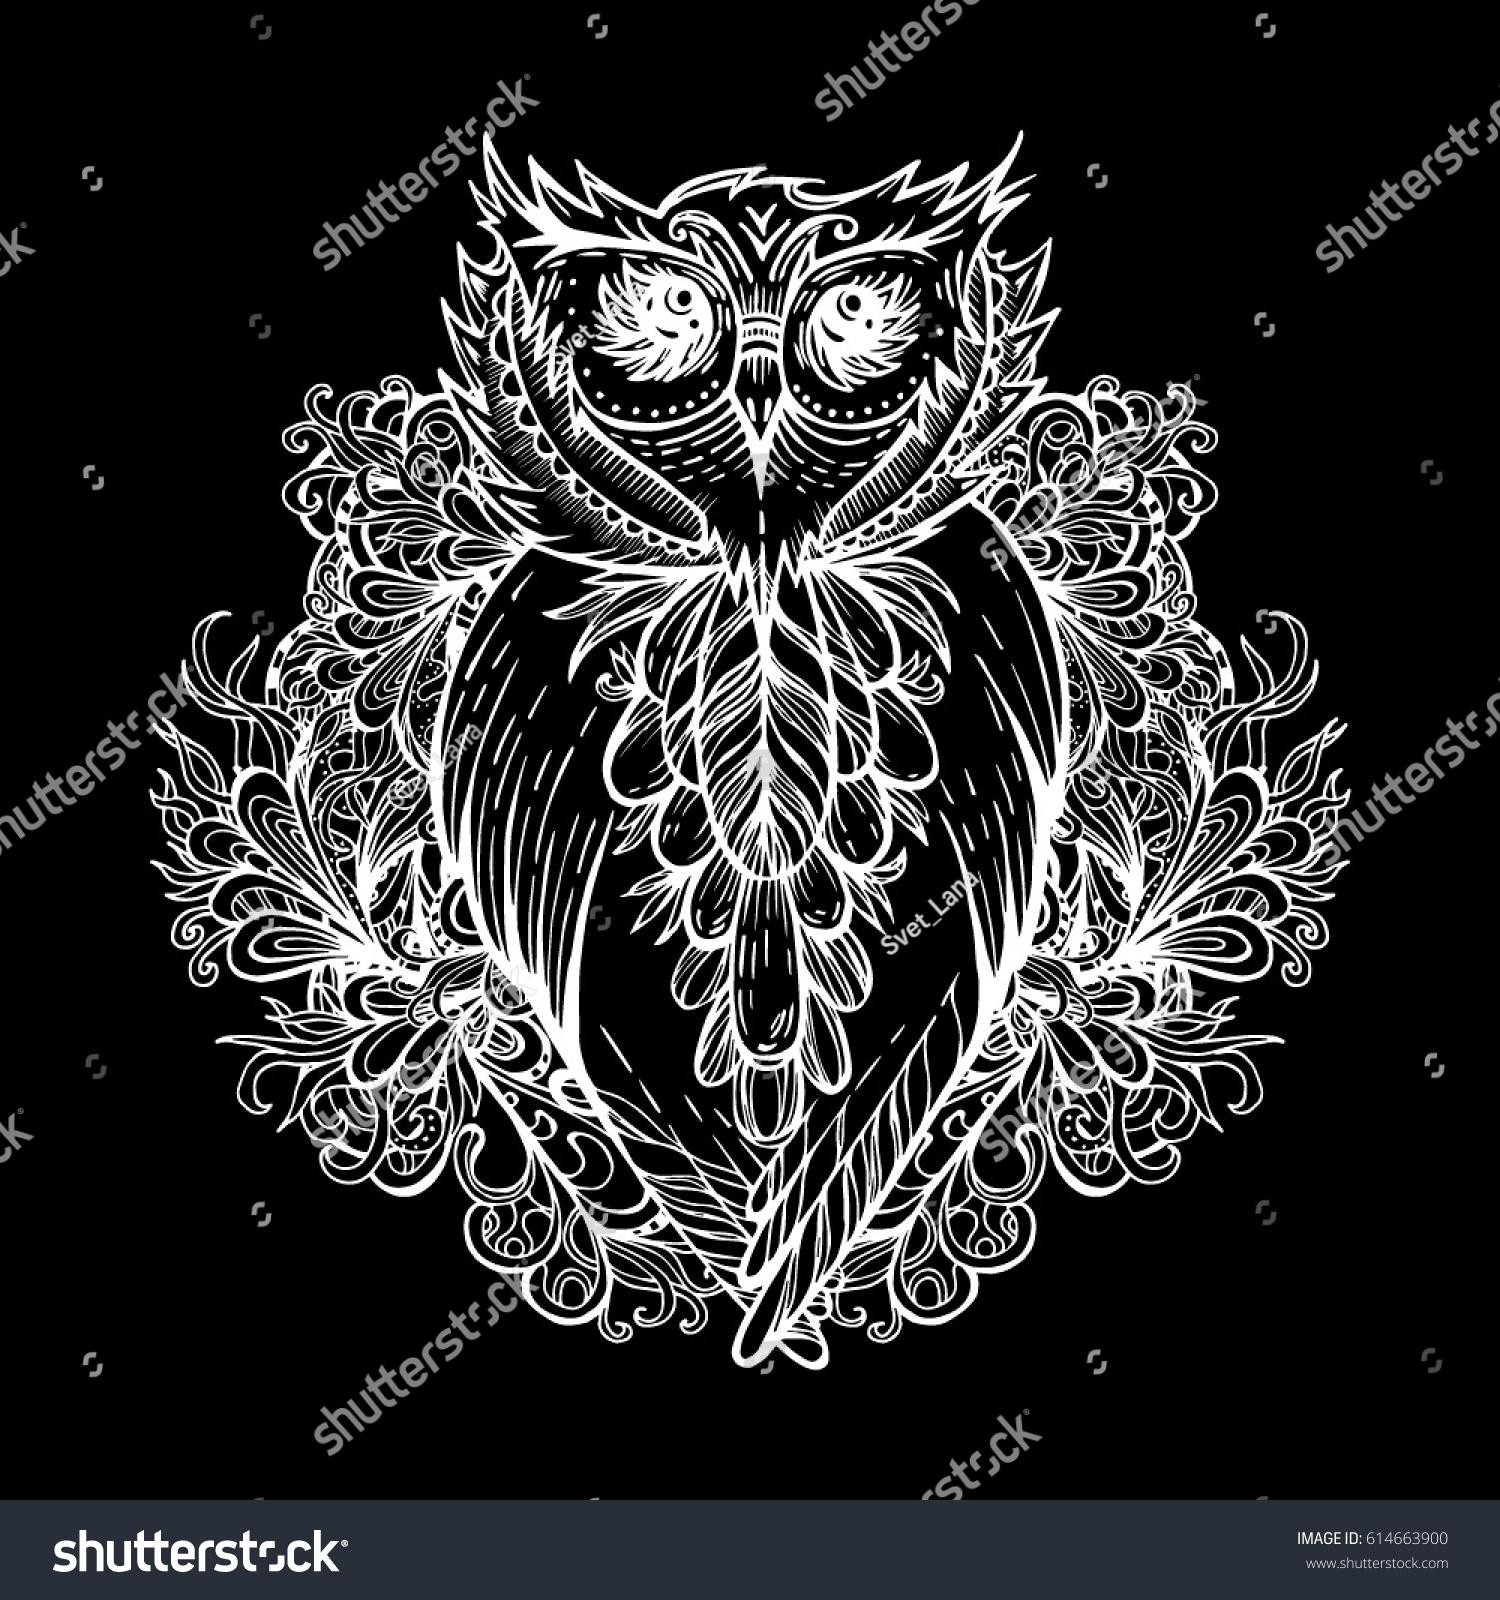 Owl Against Background Vegetative Ornamentation Tattoo Stock Vector ...